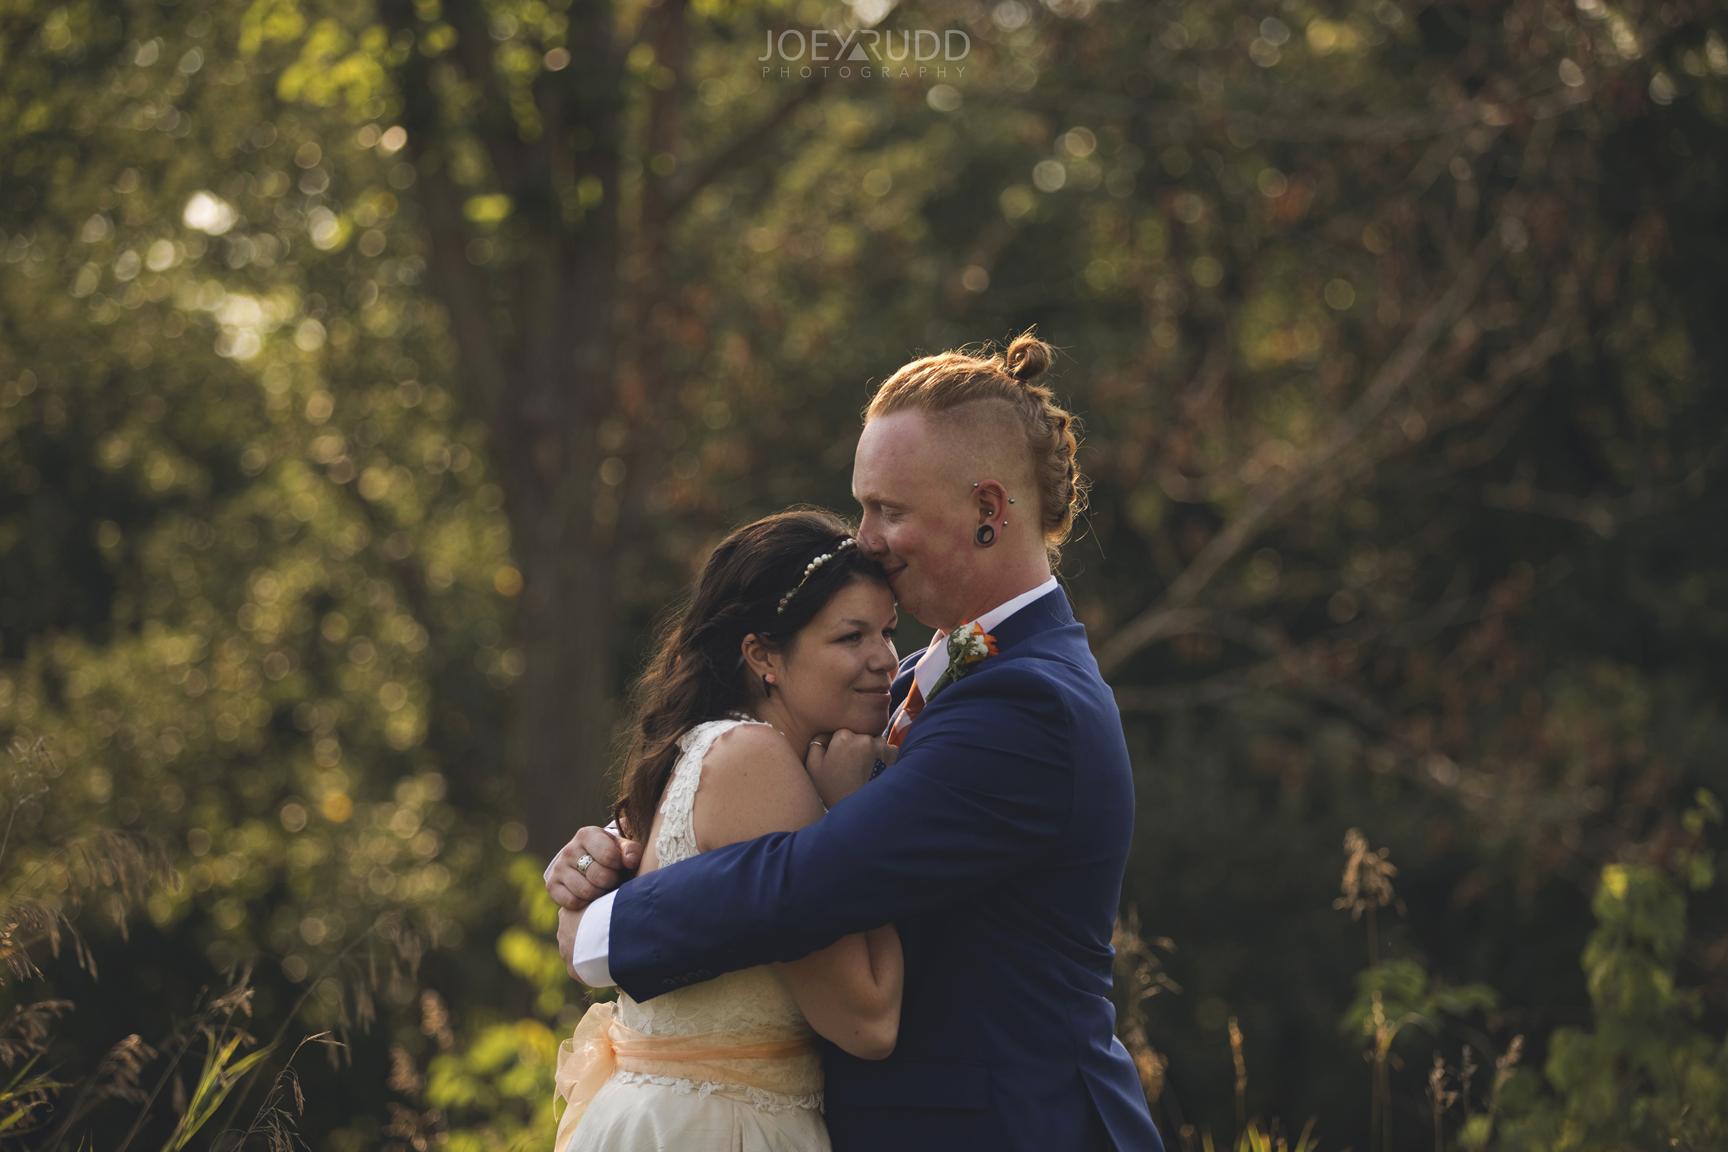 Backyard Kingston Wedding by Ottawa Wedding Photographer Joey Rudd Photography Artistic Photo